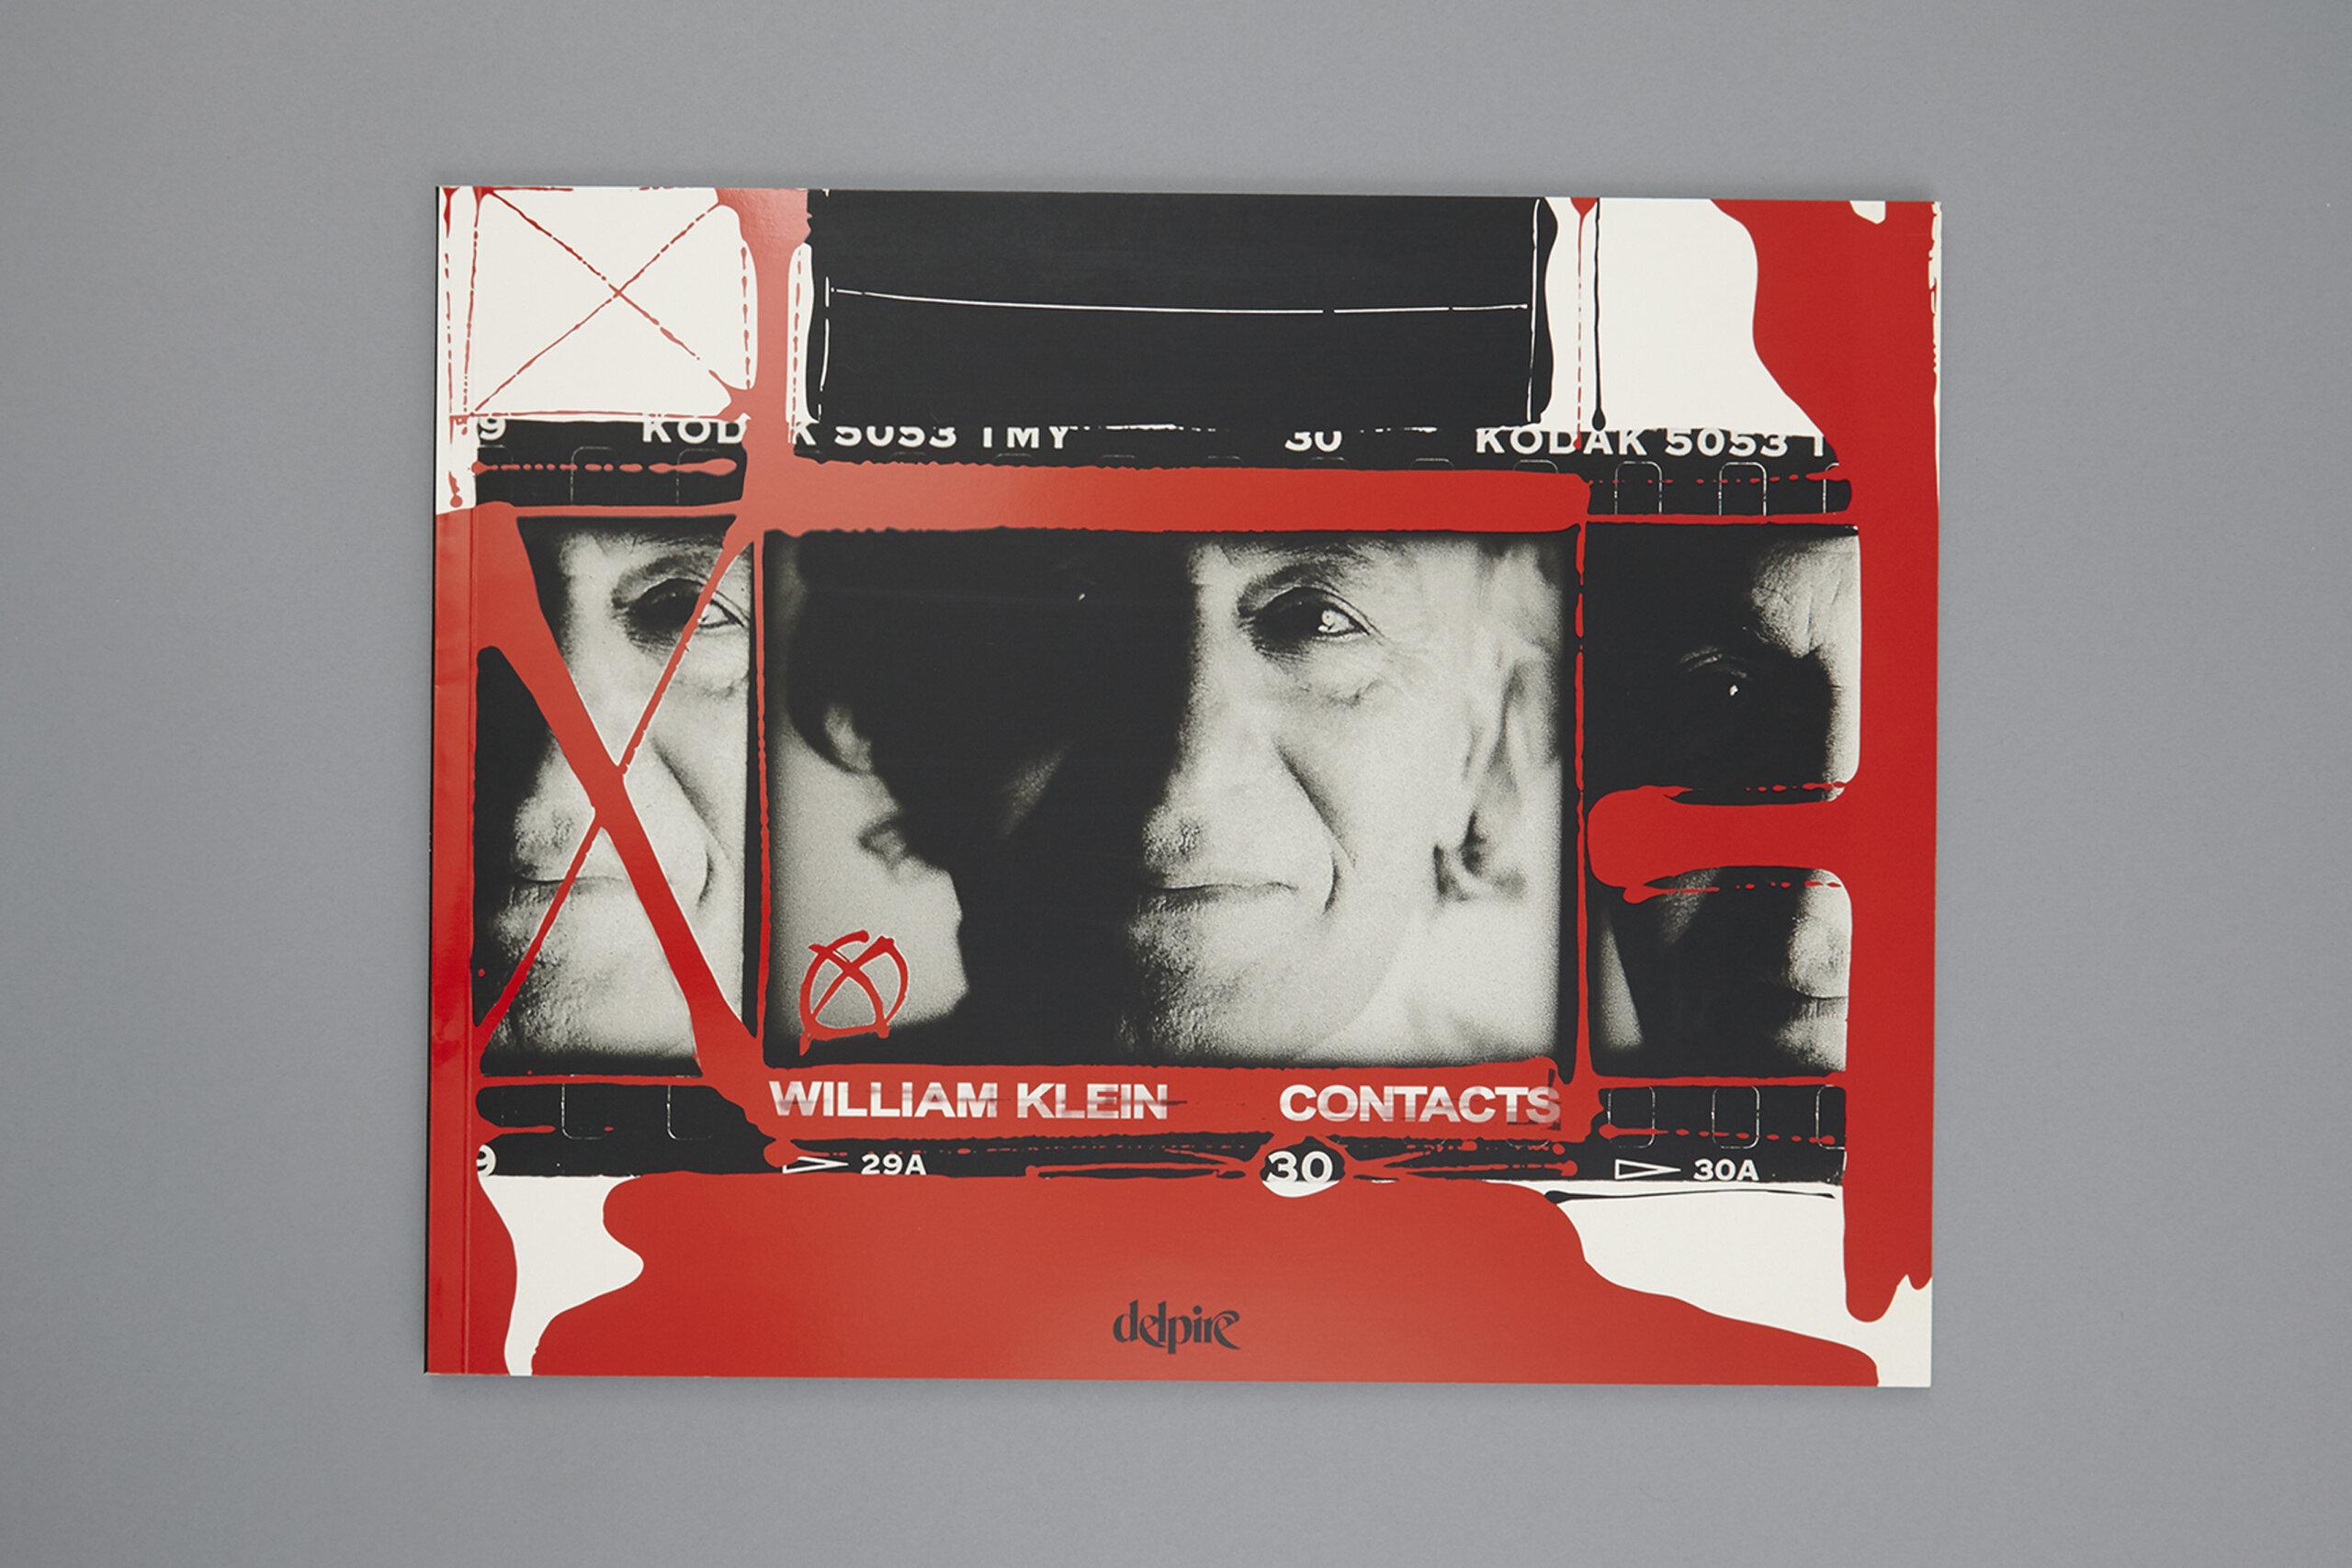 delpire-KLEIN-william-contacts2008